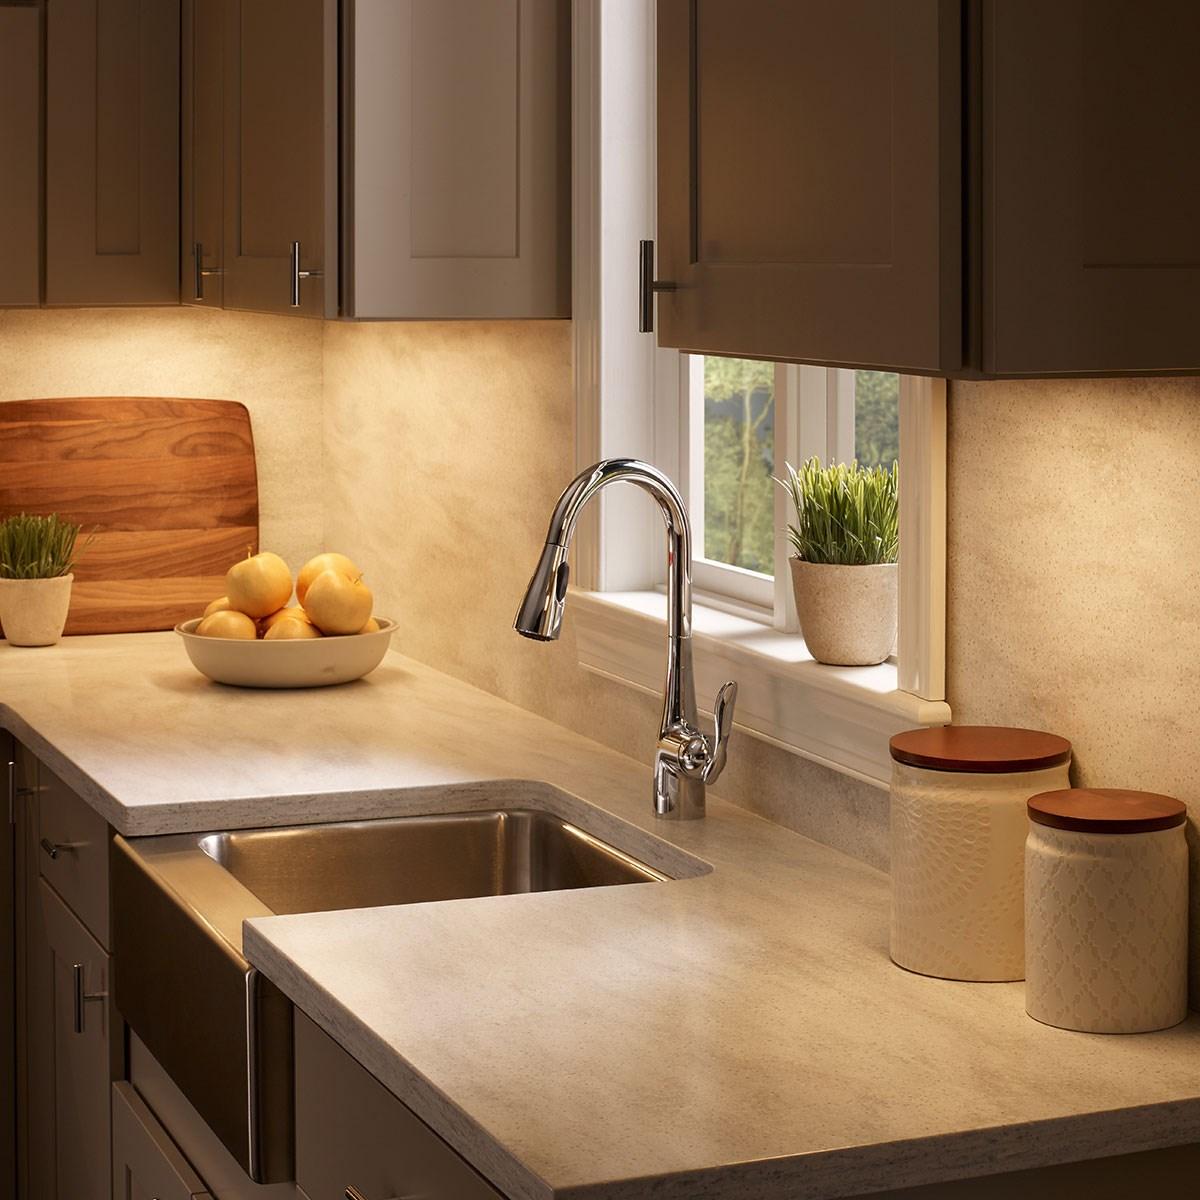 6u 30 2700k 3000k Led Cabinet Light Textured Nickel Kichler Lighting